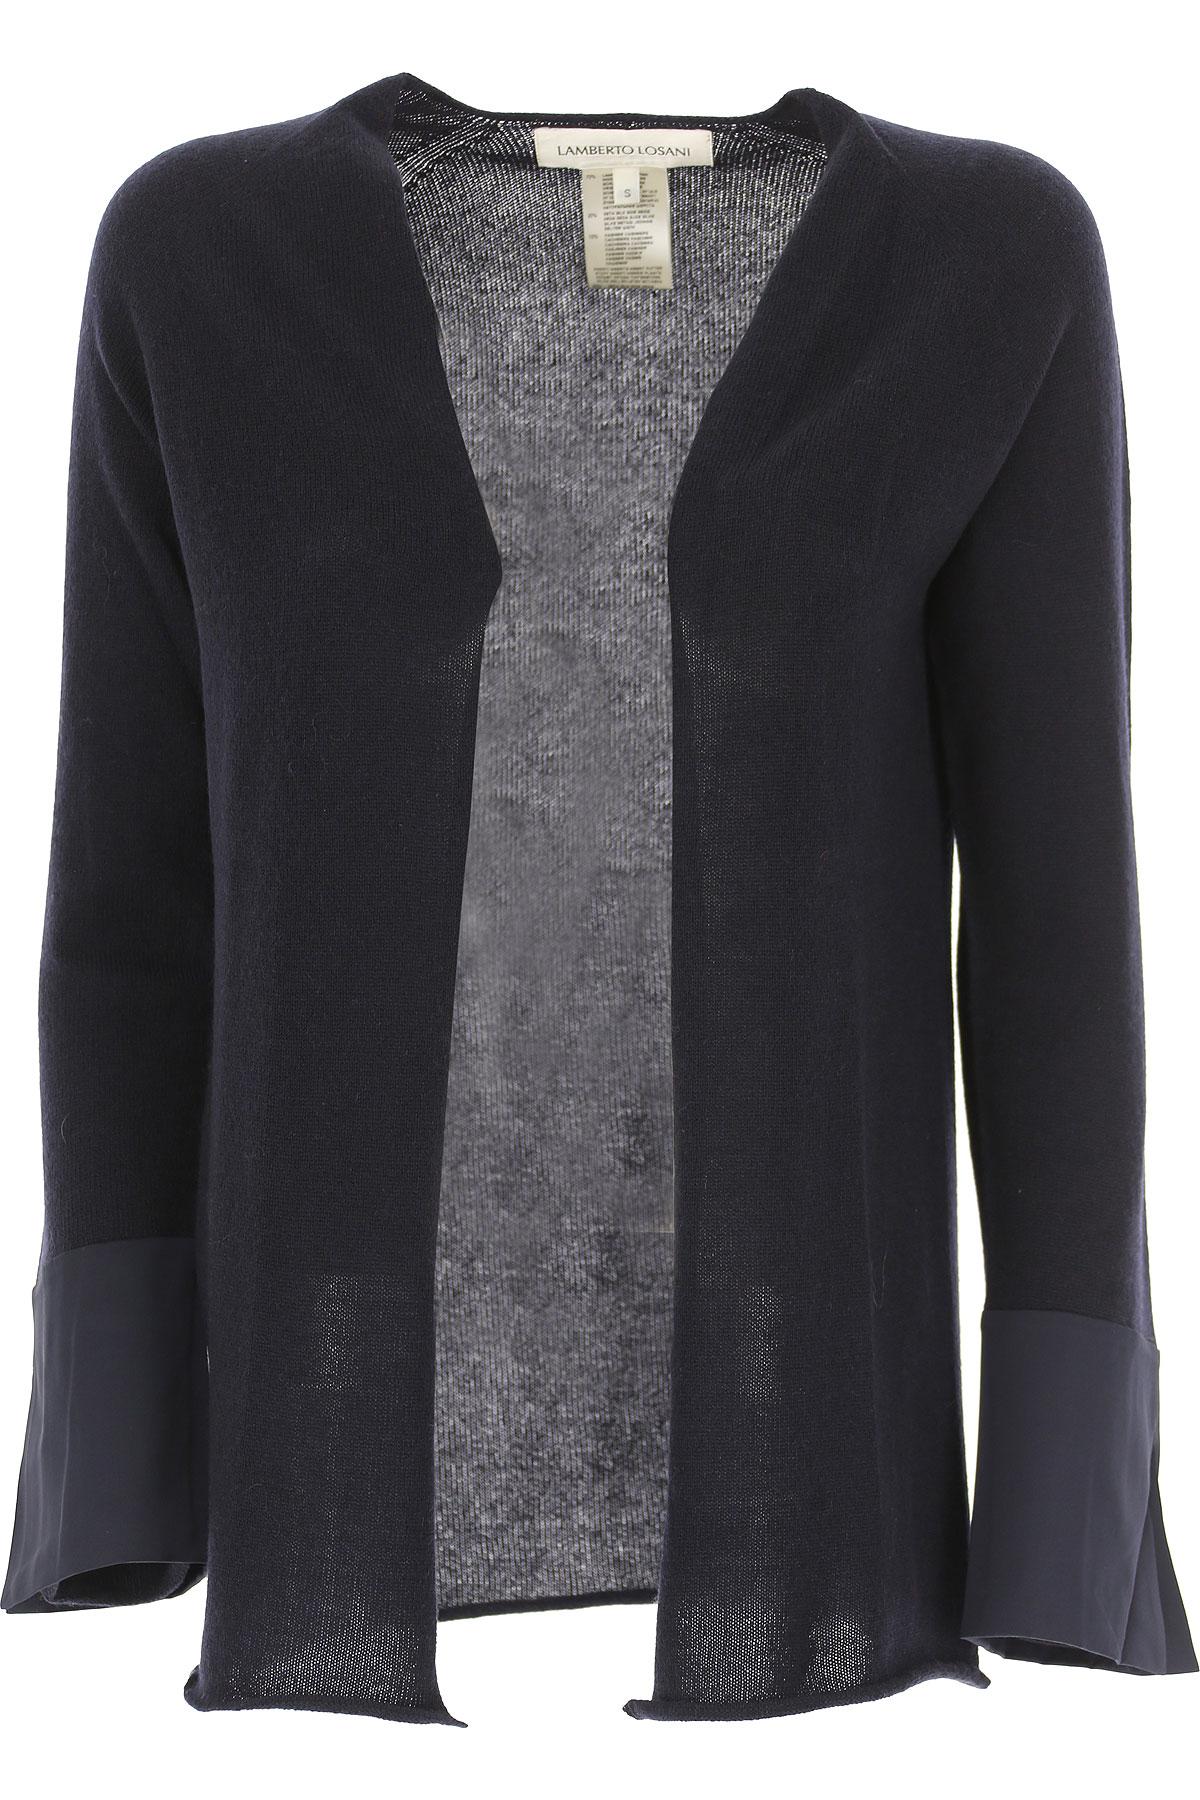 Image of Lamberto Losani Sweater for Women Jumper, Midnight Blue, Virgin wool, 2017, 4 6